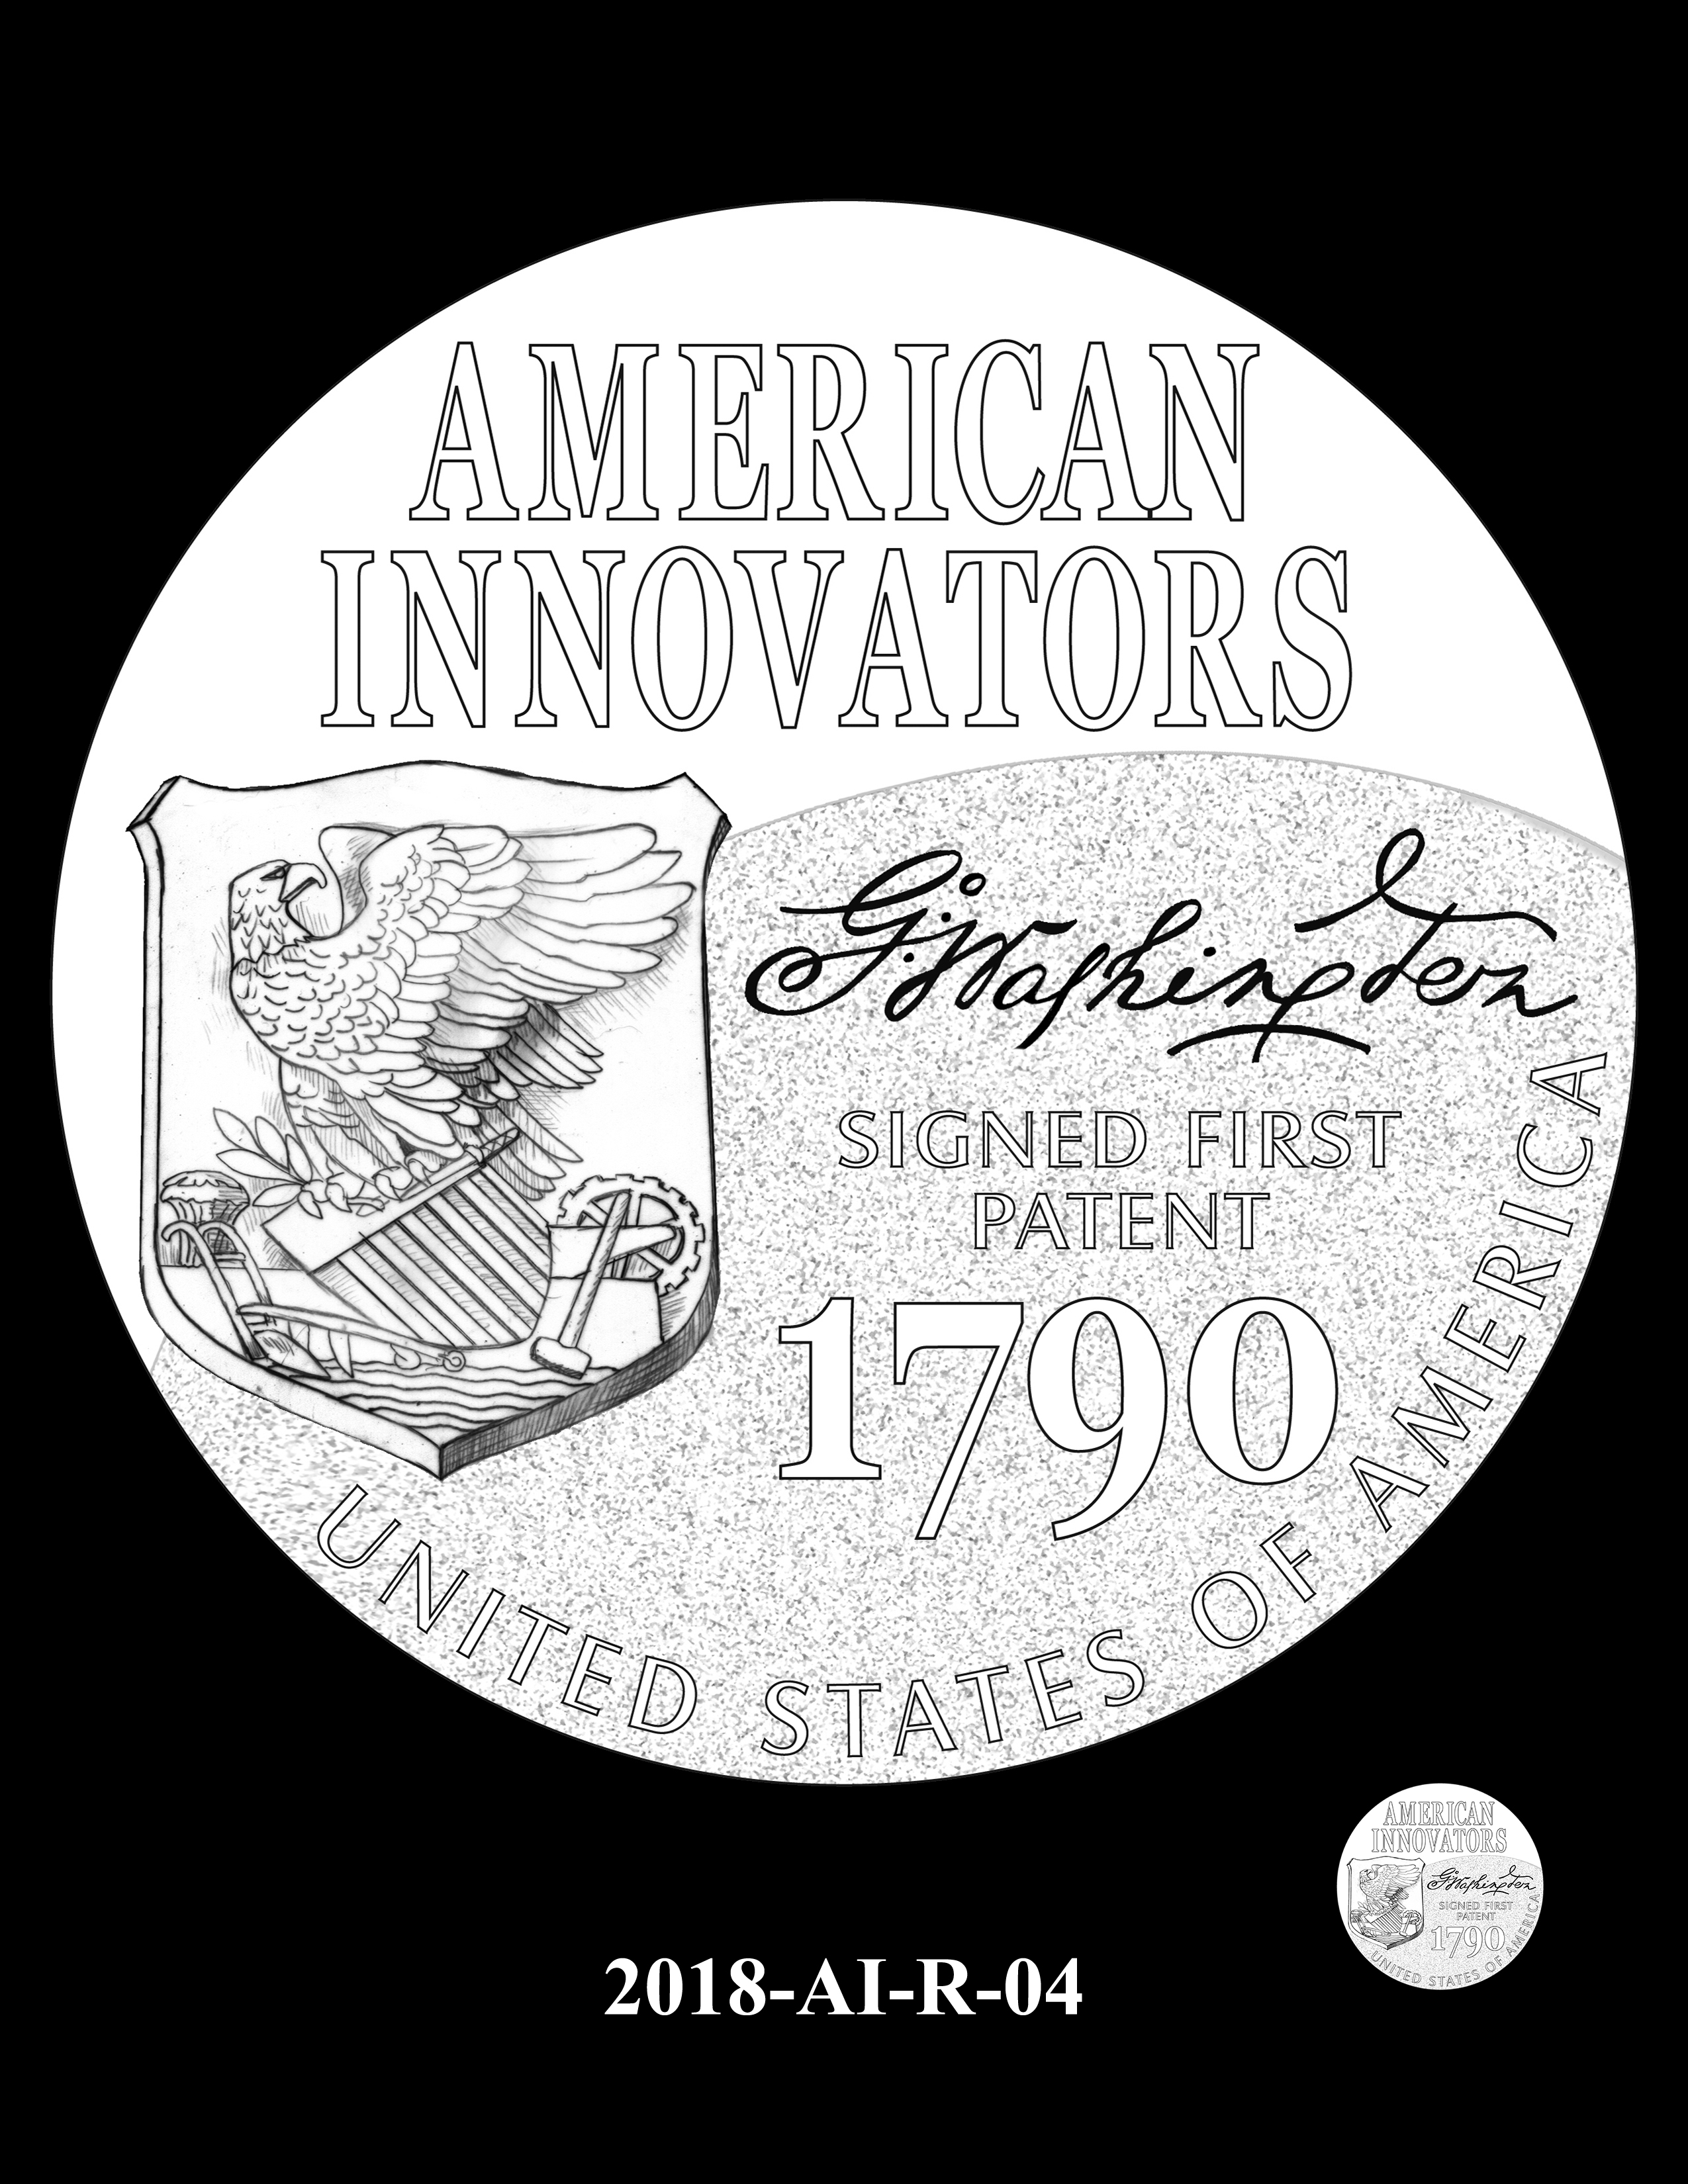 2018-AI-R-04 -- 2018 American Innovation $1 Coin